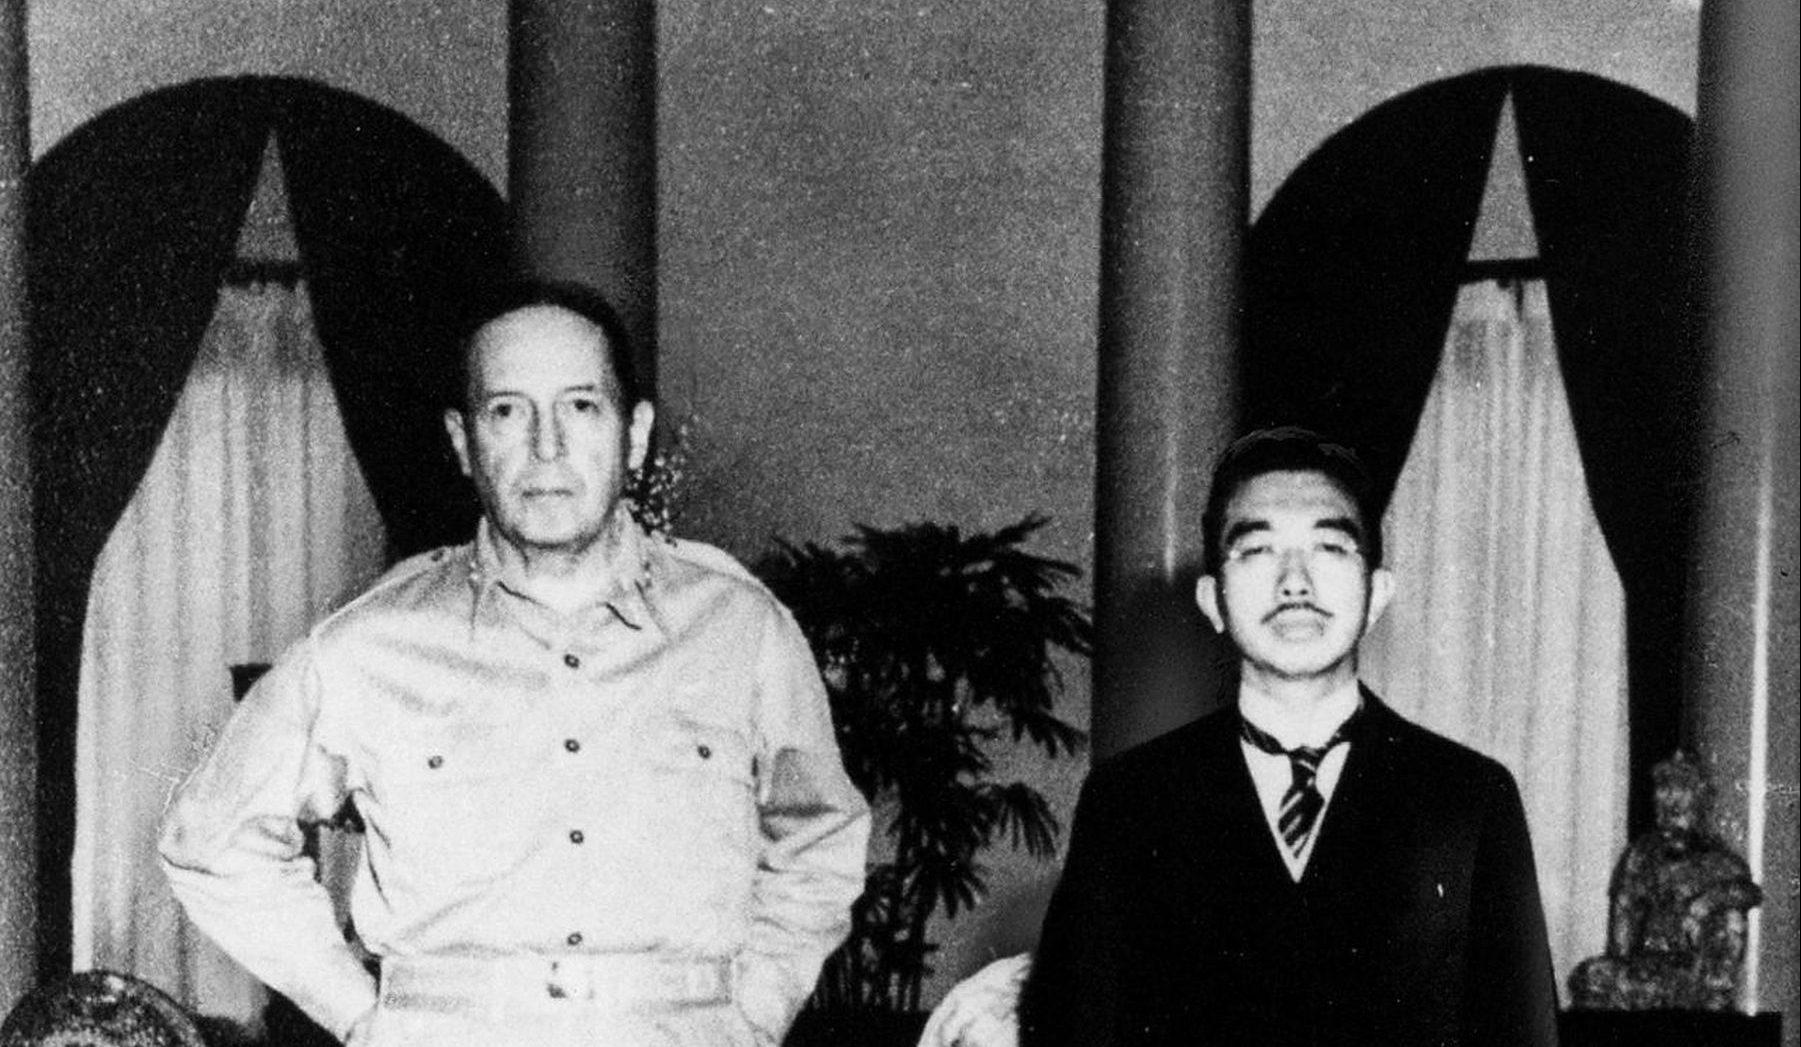 Emperor Showa Favored Japans Rearmament, Documents Reveal 011